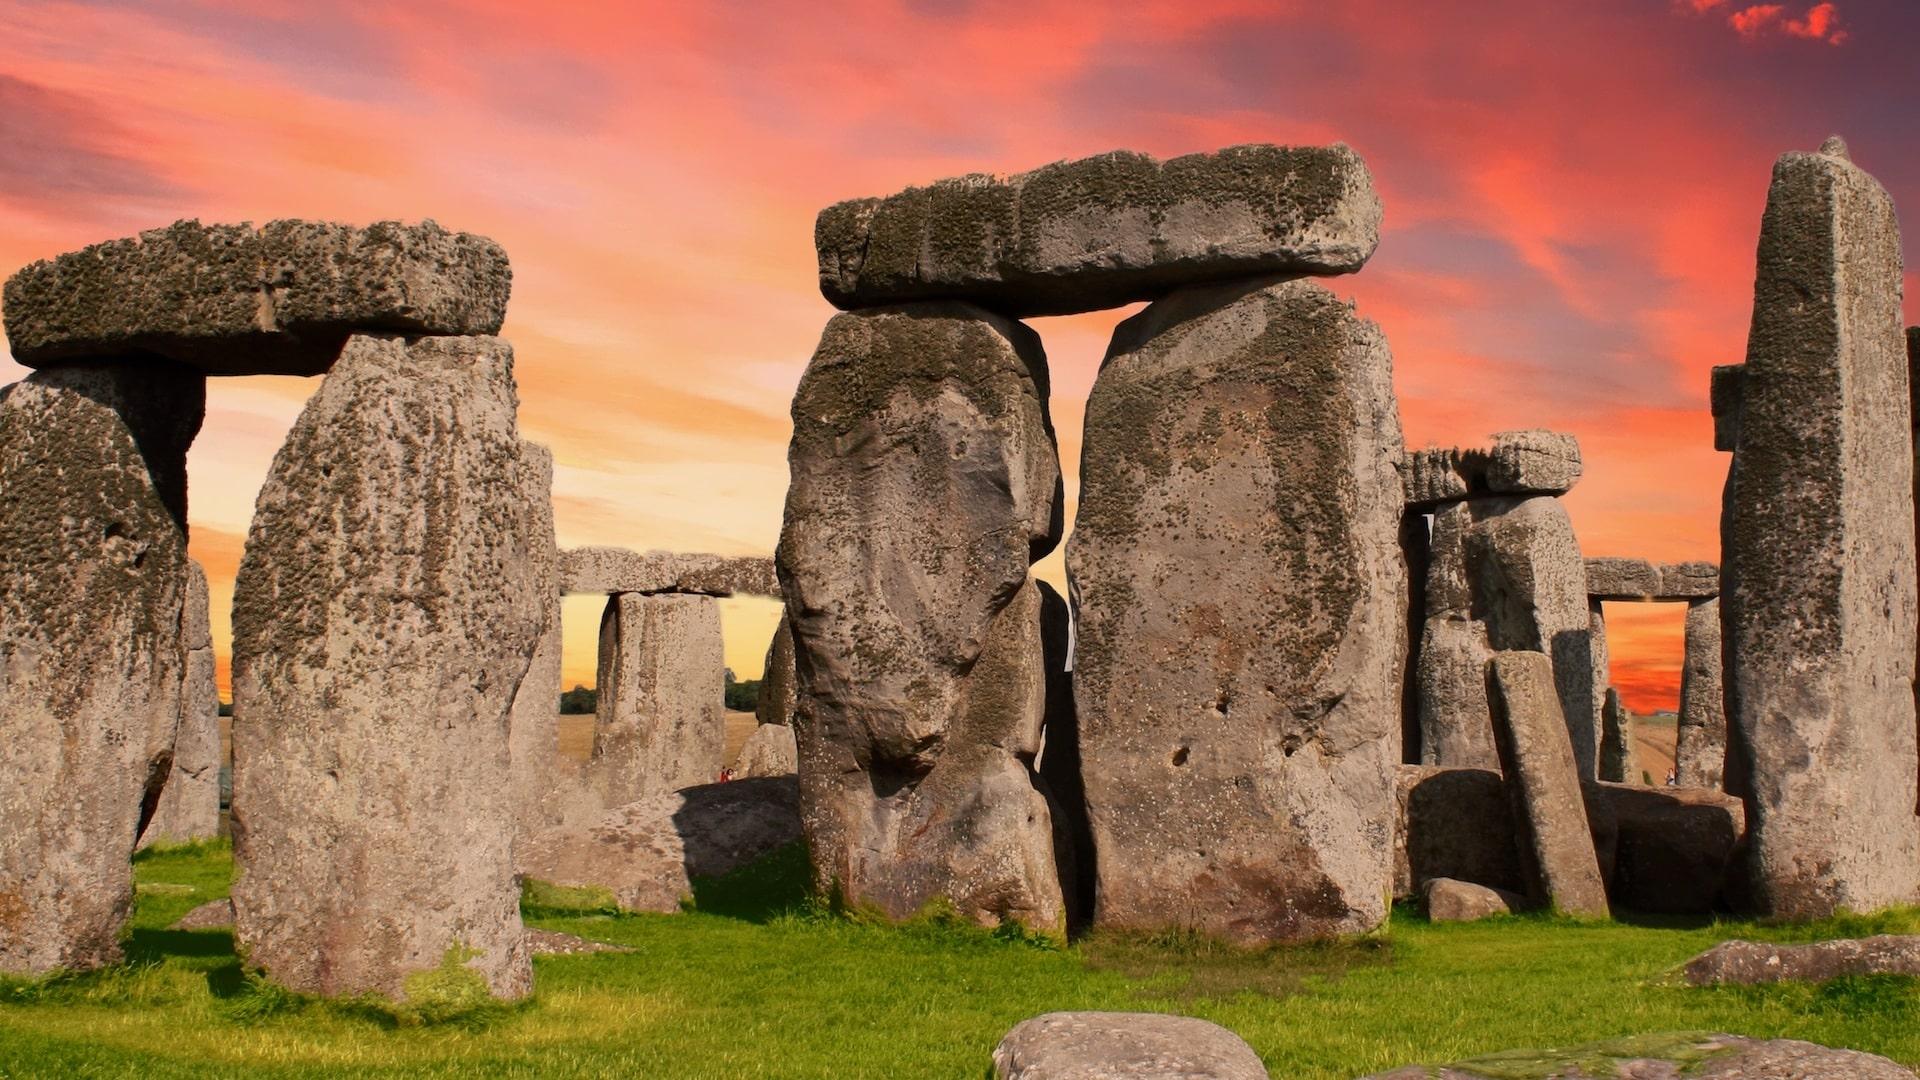 Remembering the memories of our ancestors